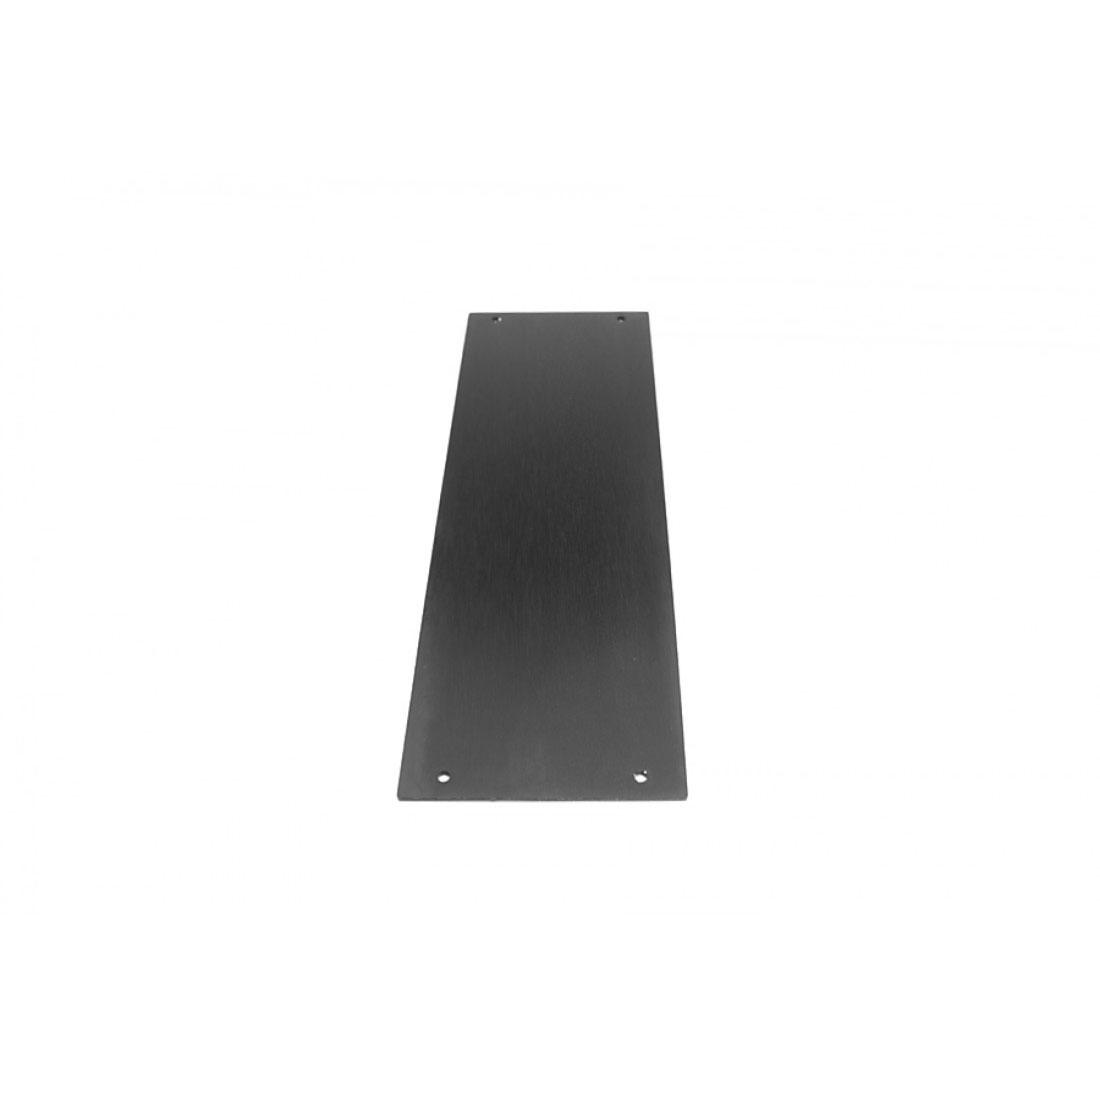 1NPDA03300B - 3U Krabice s chladičem, 300mm, 10mm-panel stříbrný, AL víka